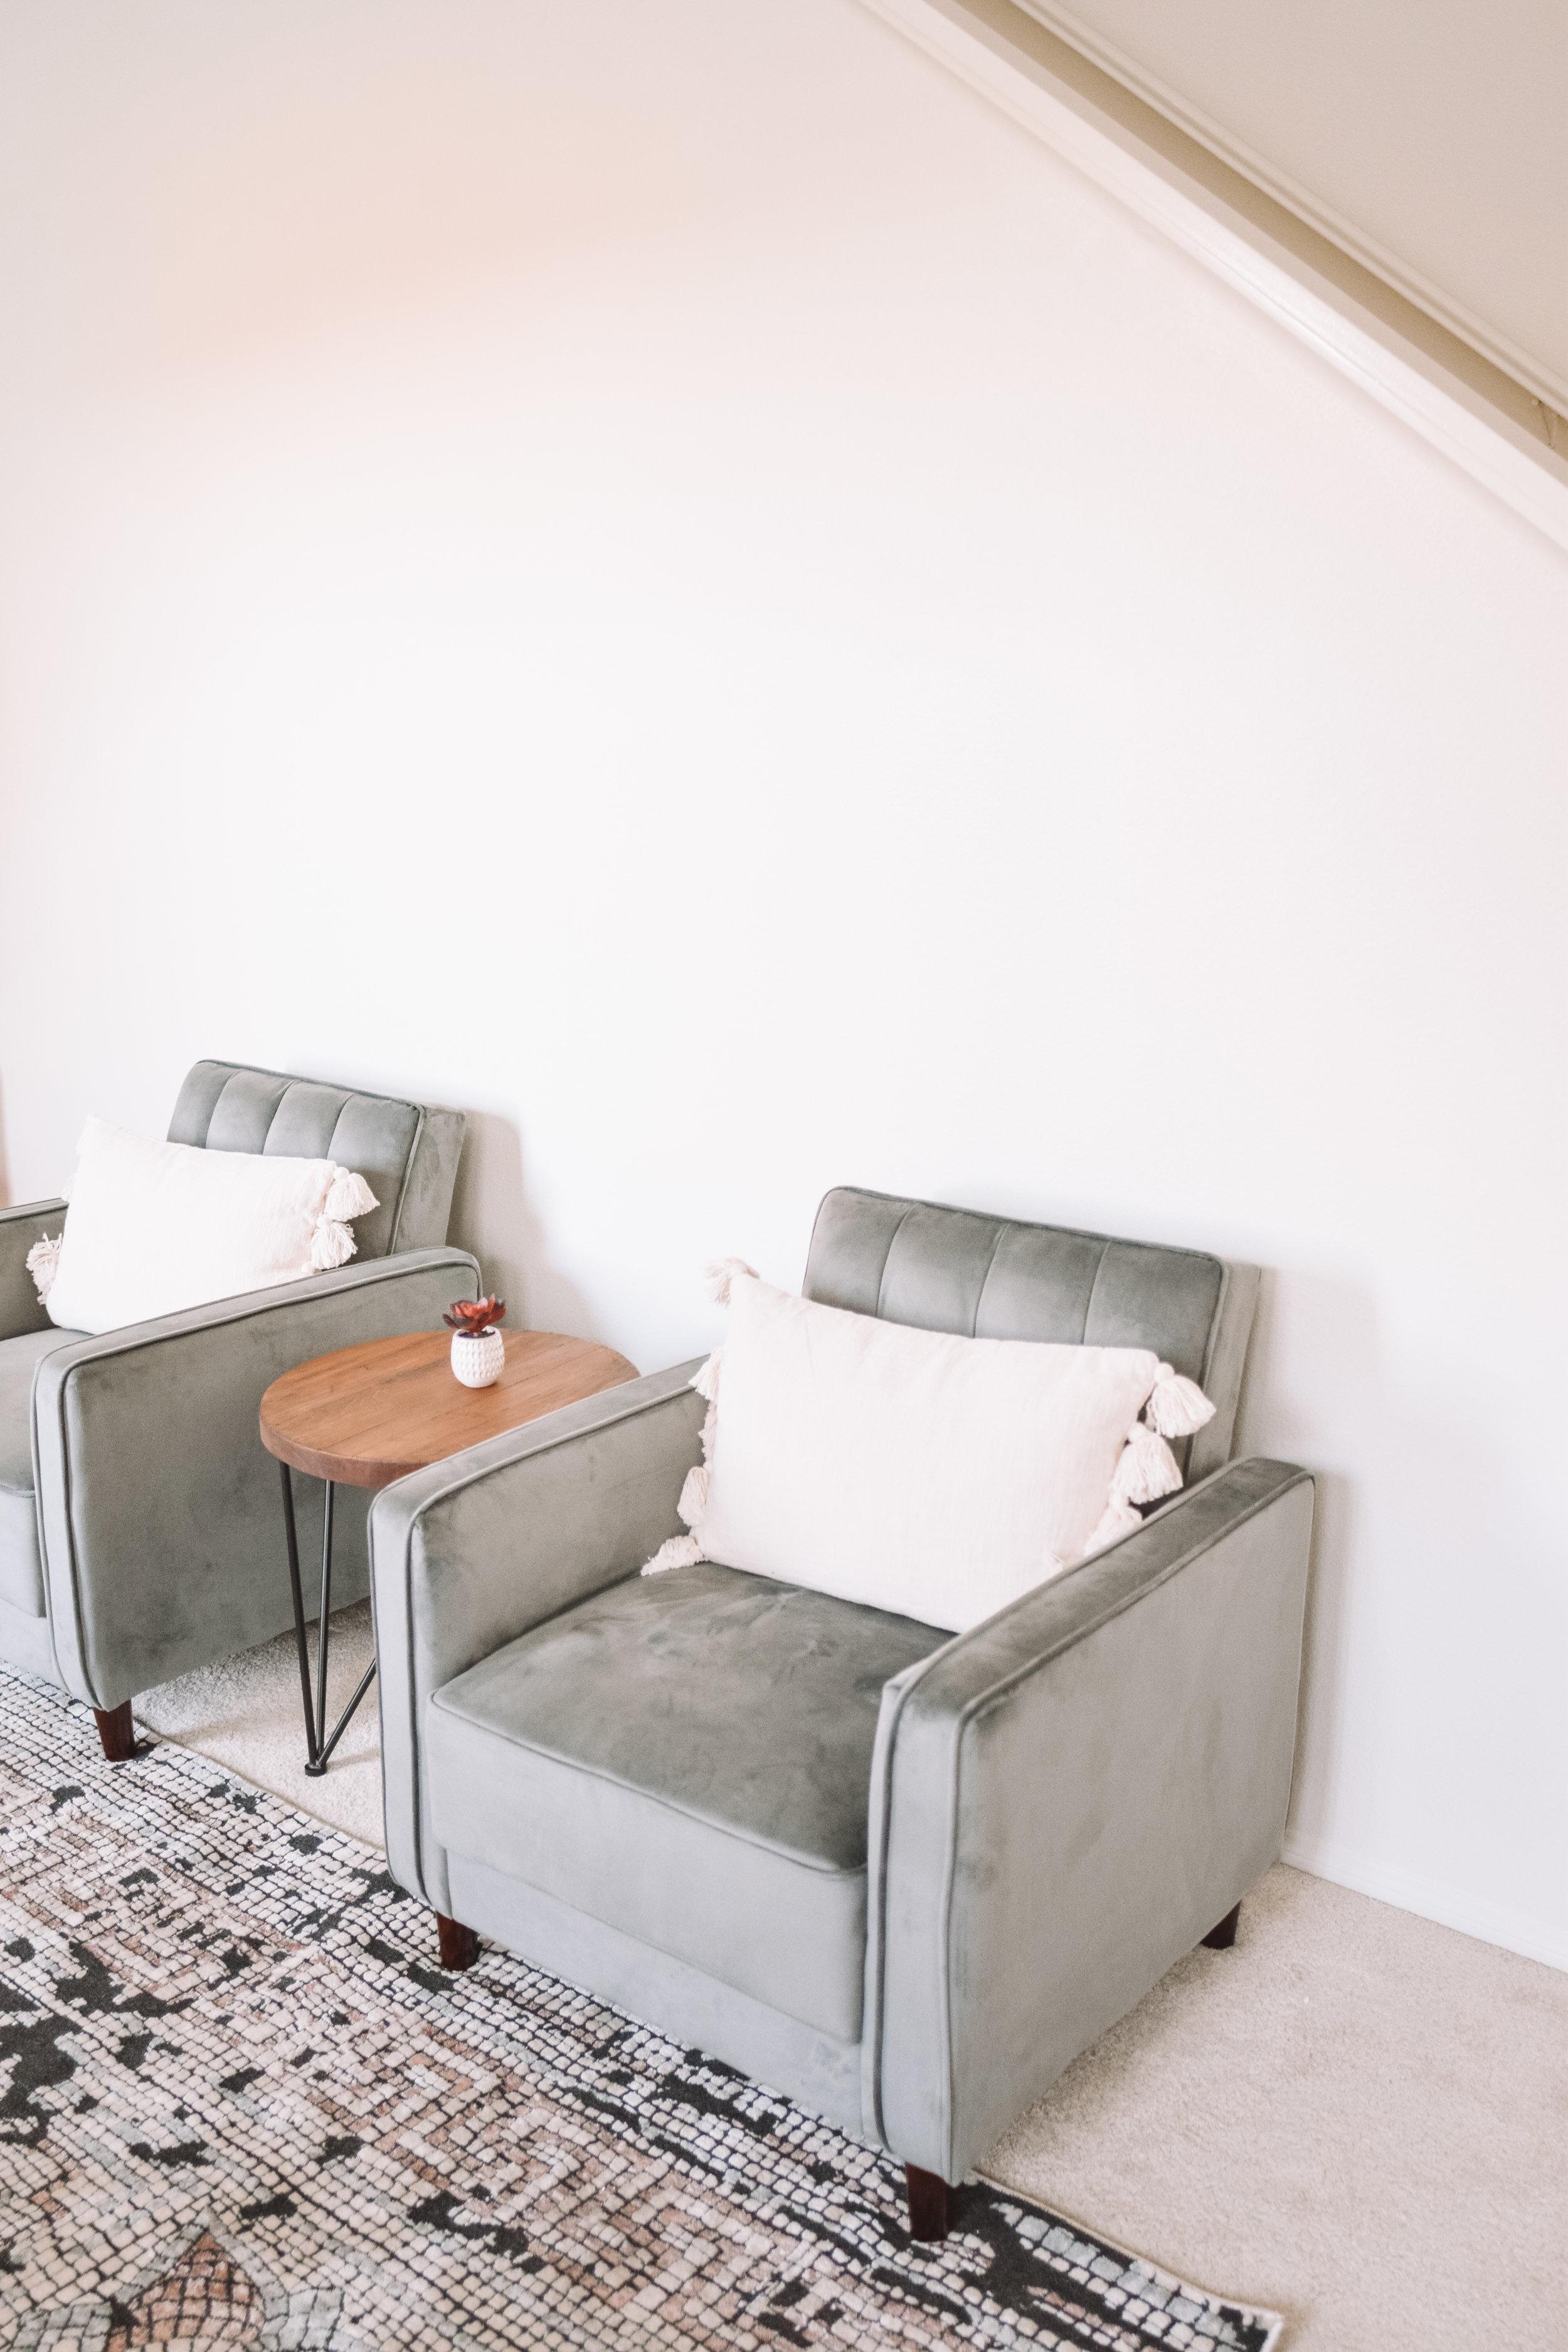 Grey Velvet Formal Living Room Couches - Living Room Front Room Furniture Inspiration - The Overwhelmed Mommy Blogger